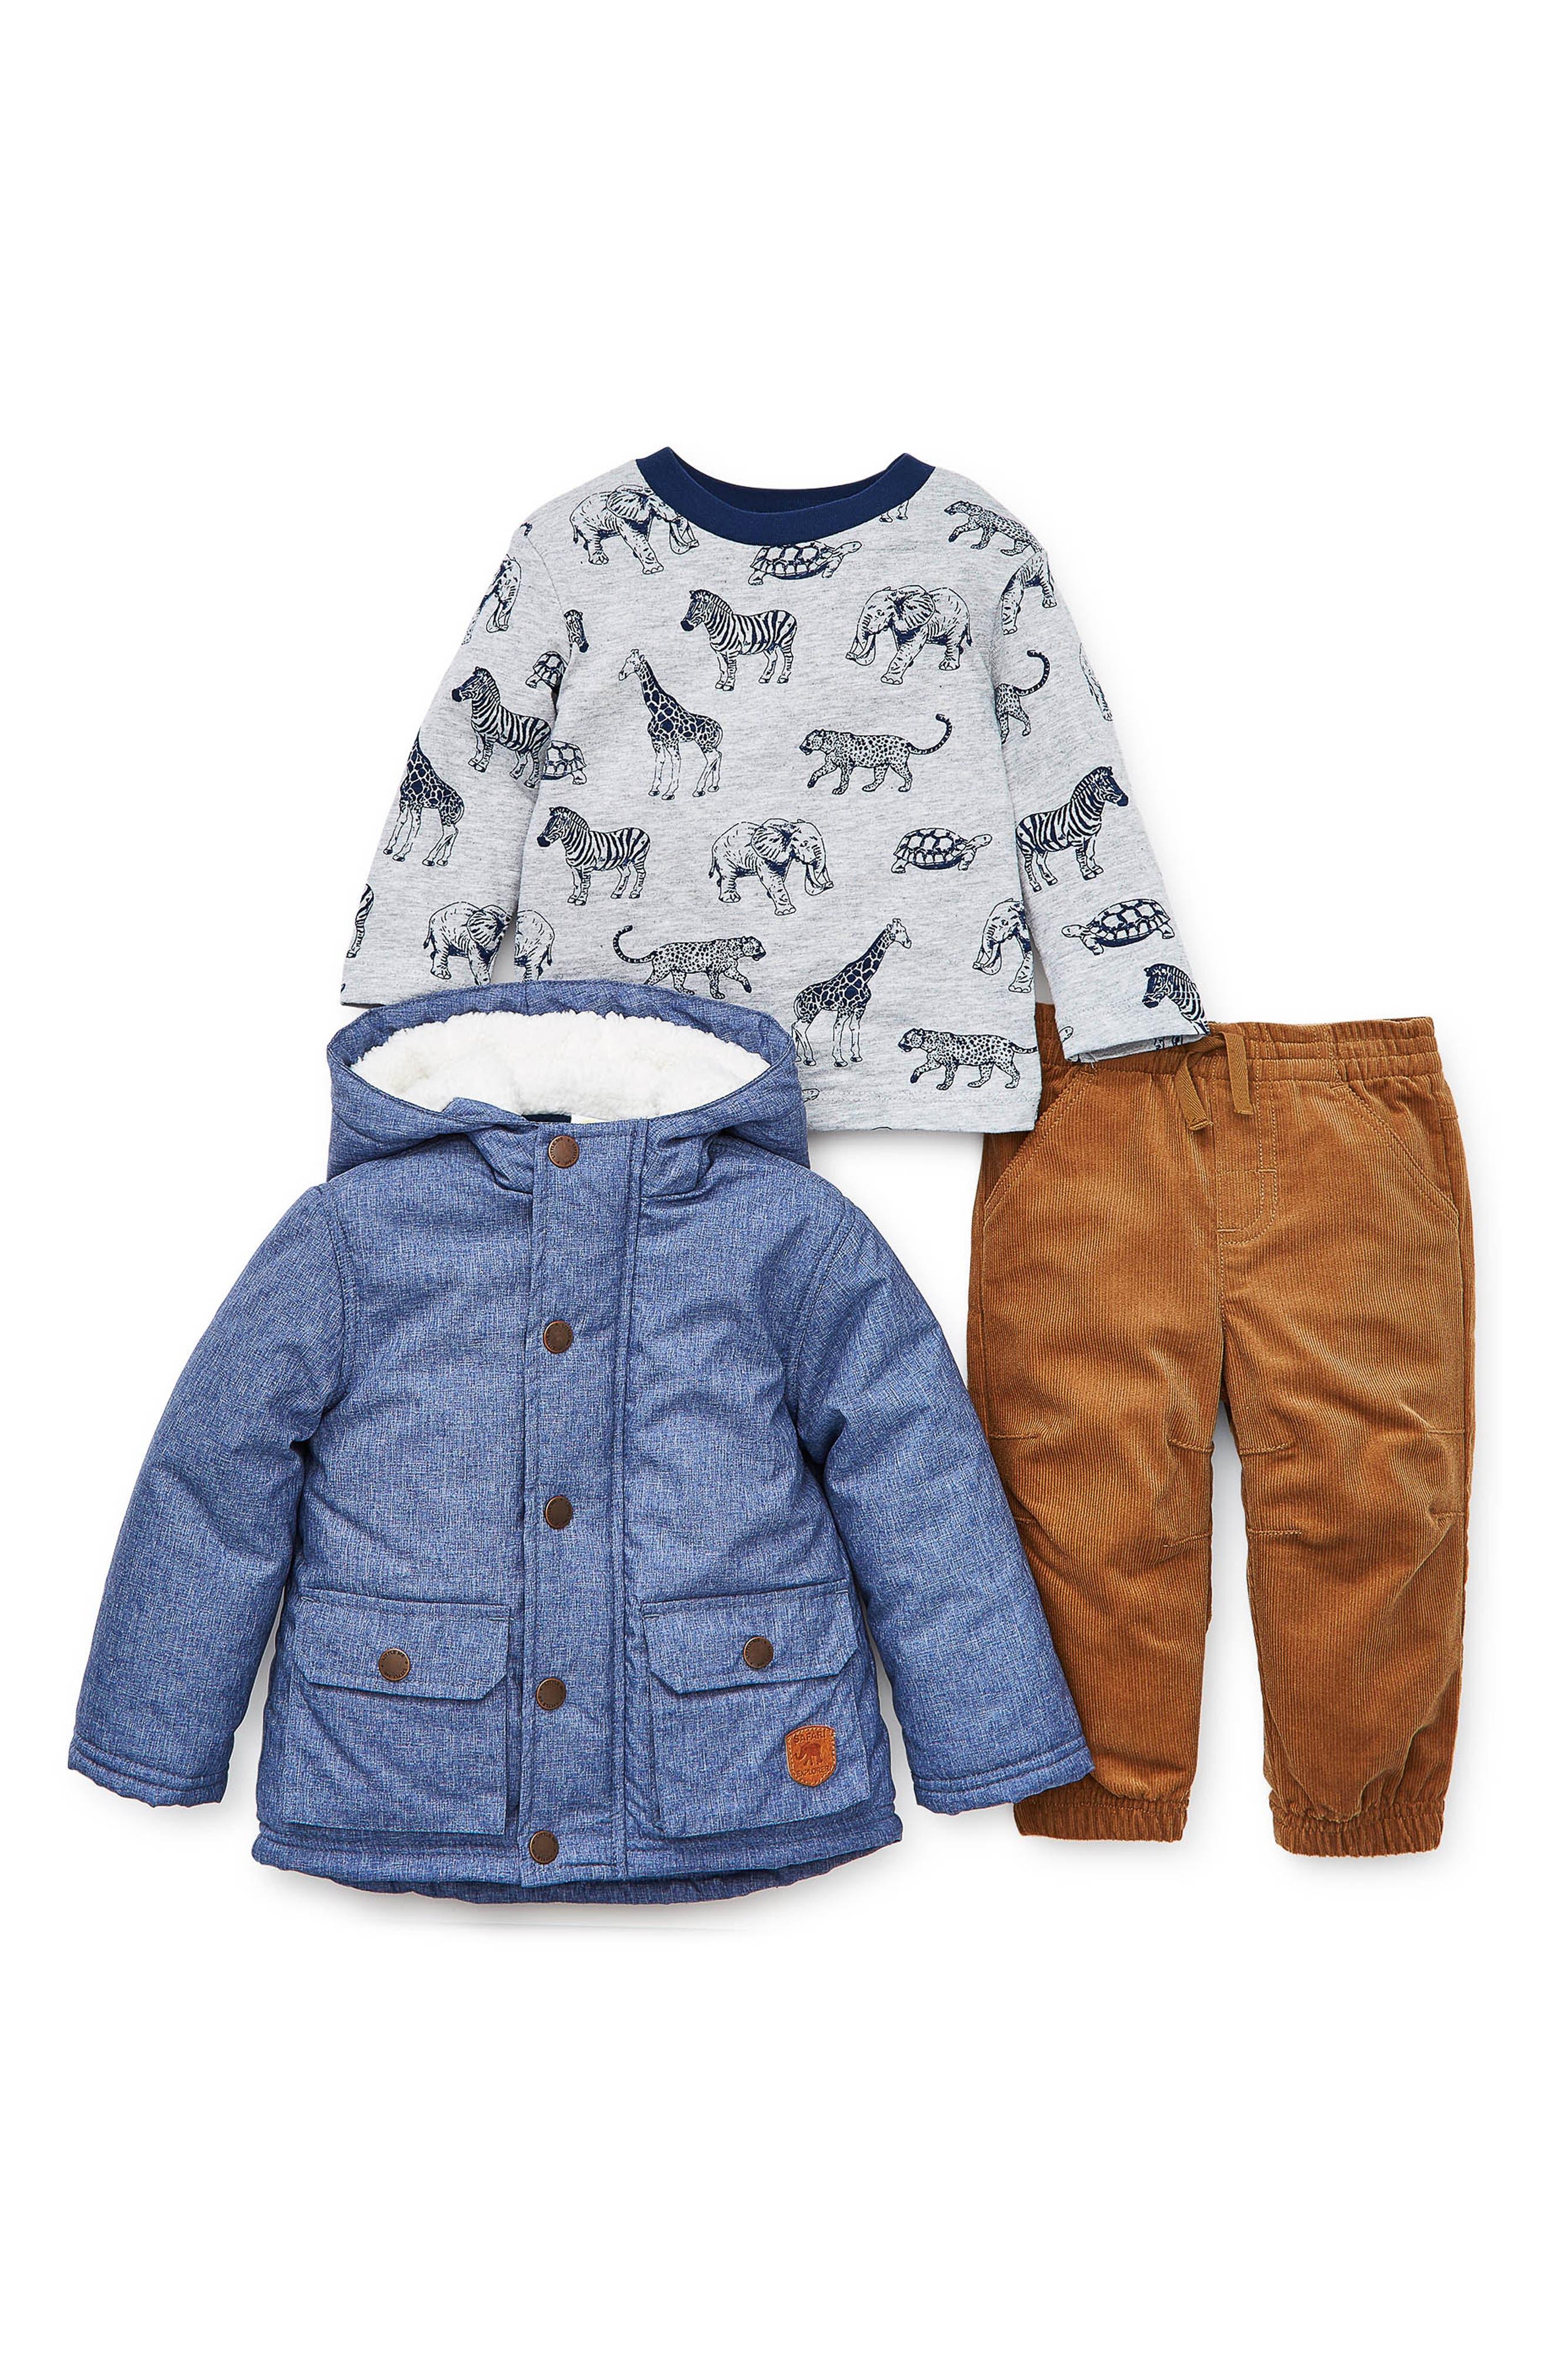 Infant Boys Little Me Hooded Chambray Jacket TShirt  Corduroy Pants Set